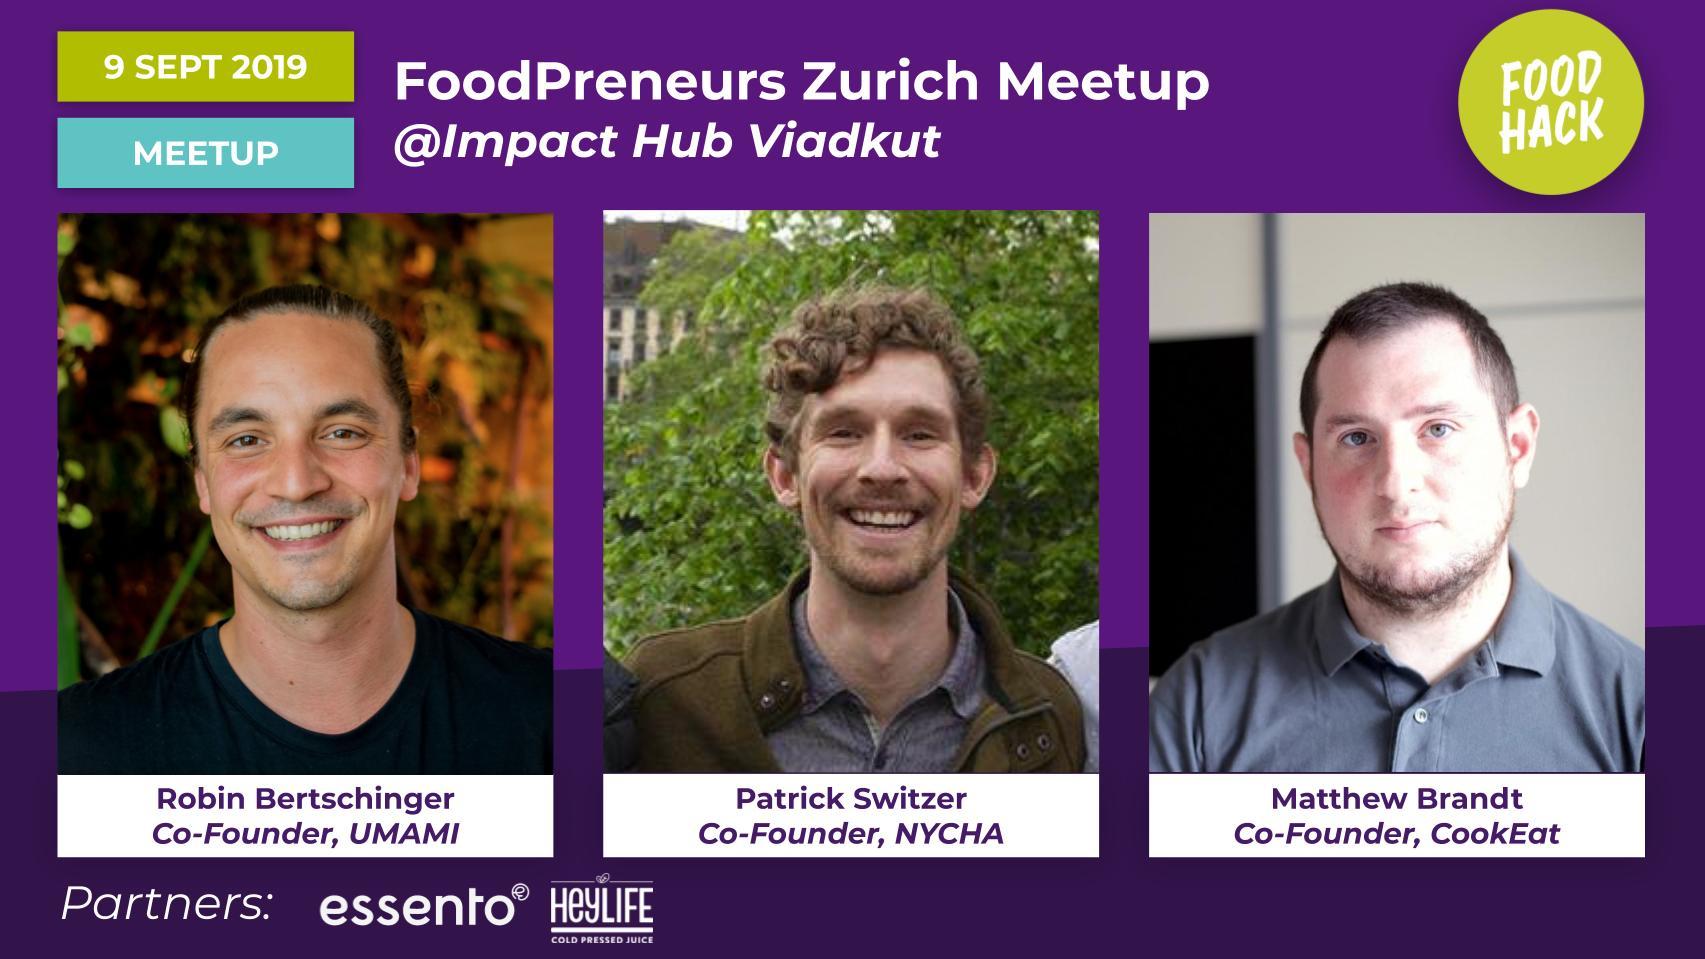 FoodHack Zurich Speakers - UMAMI, NYCHA, Cook Eat